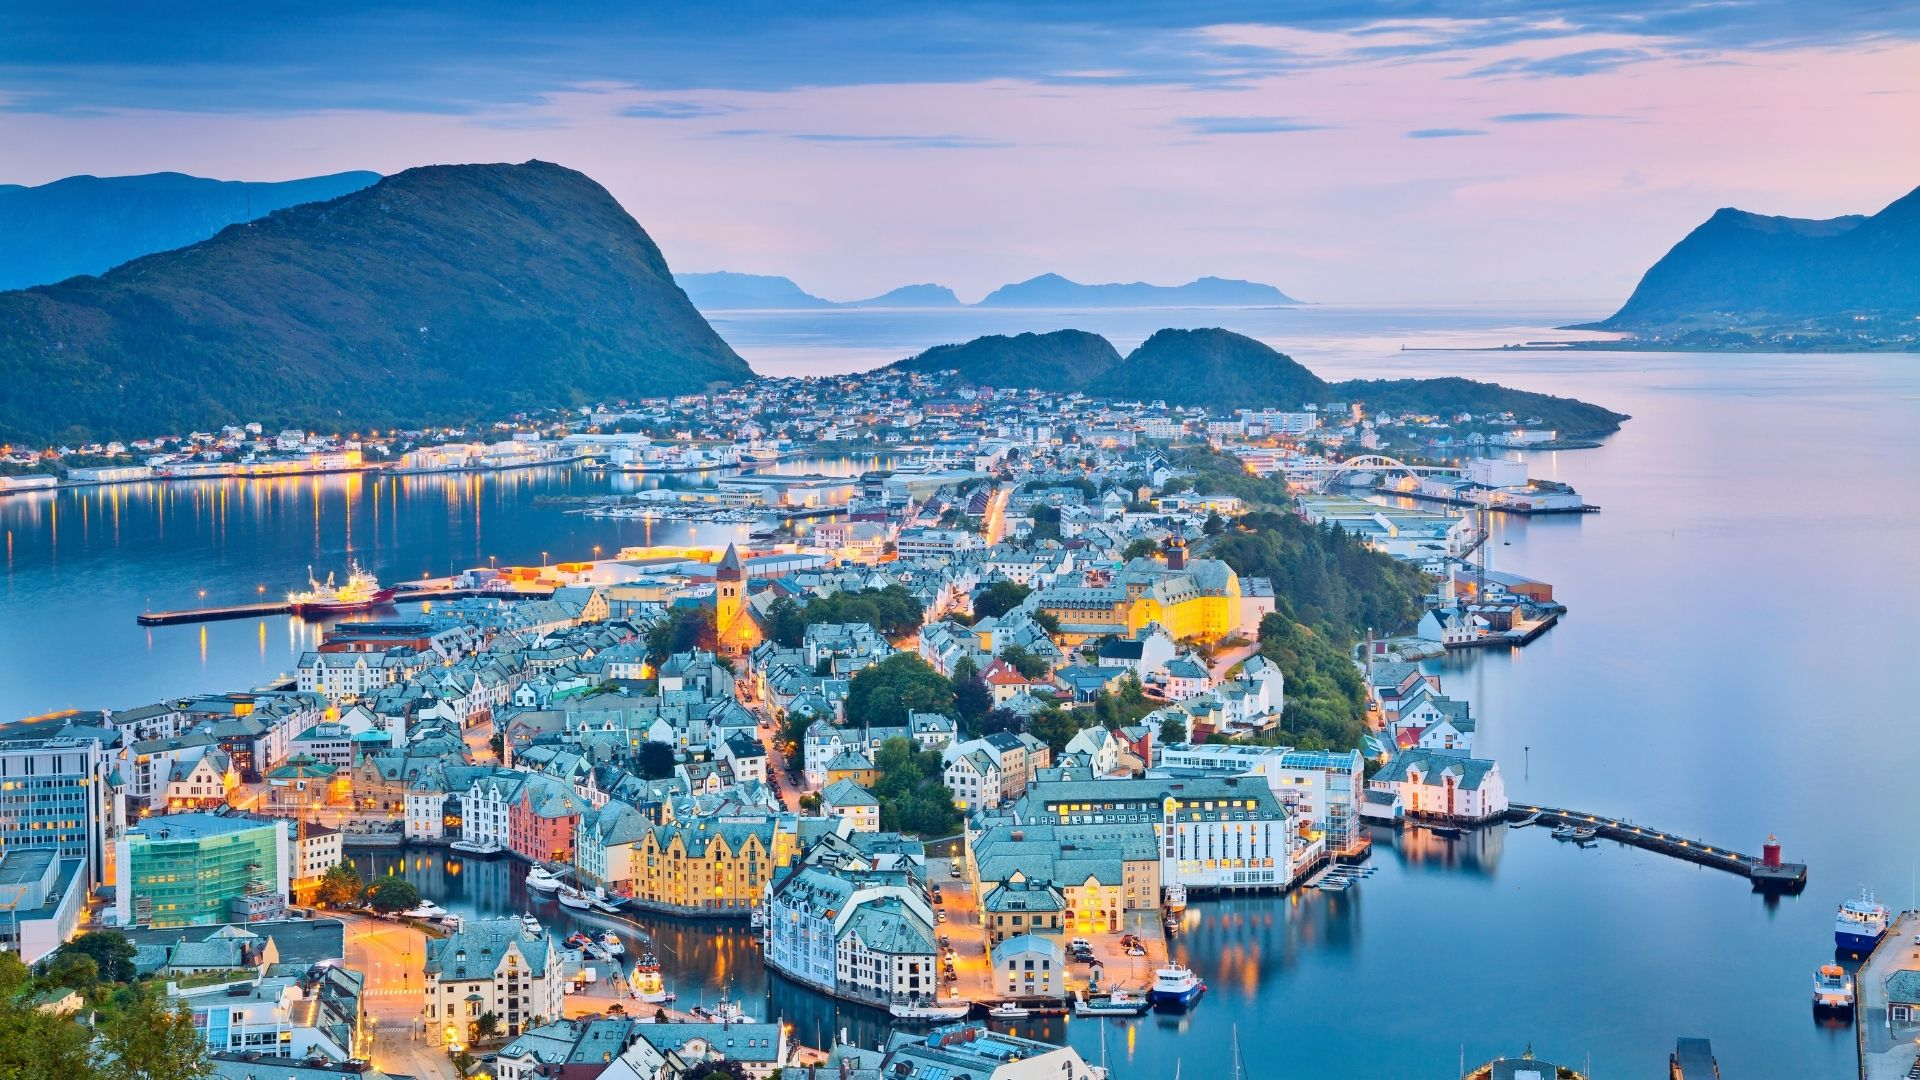 Norveç Vizesi: Randevu ve Başvuru (2021) 2 – norvec vize 3